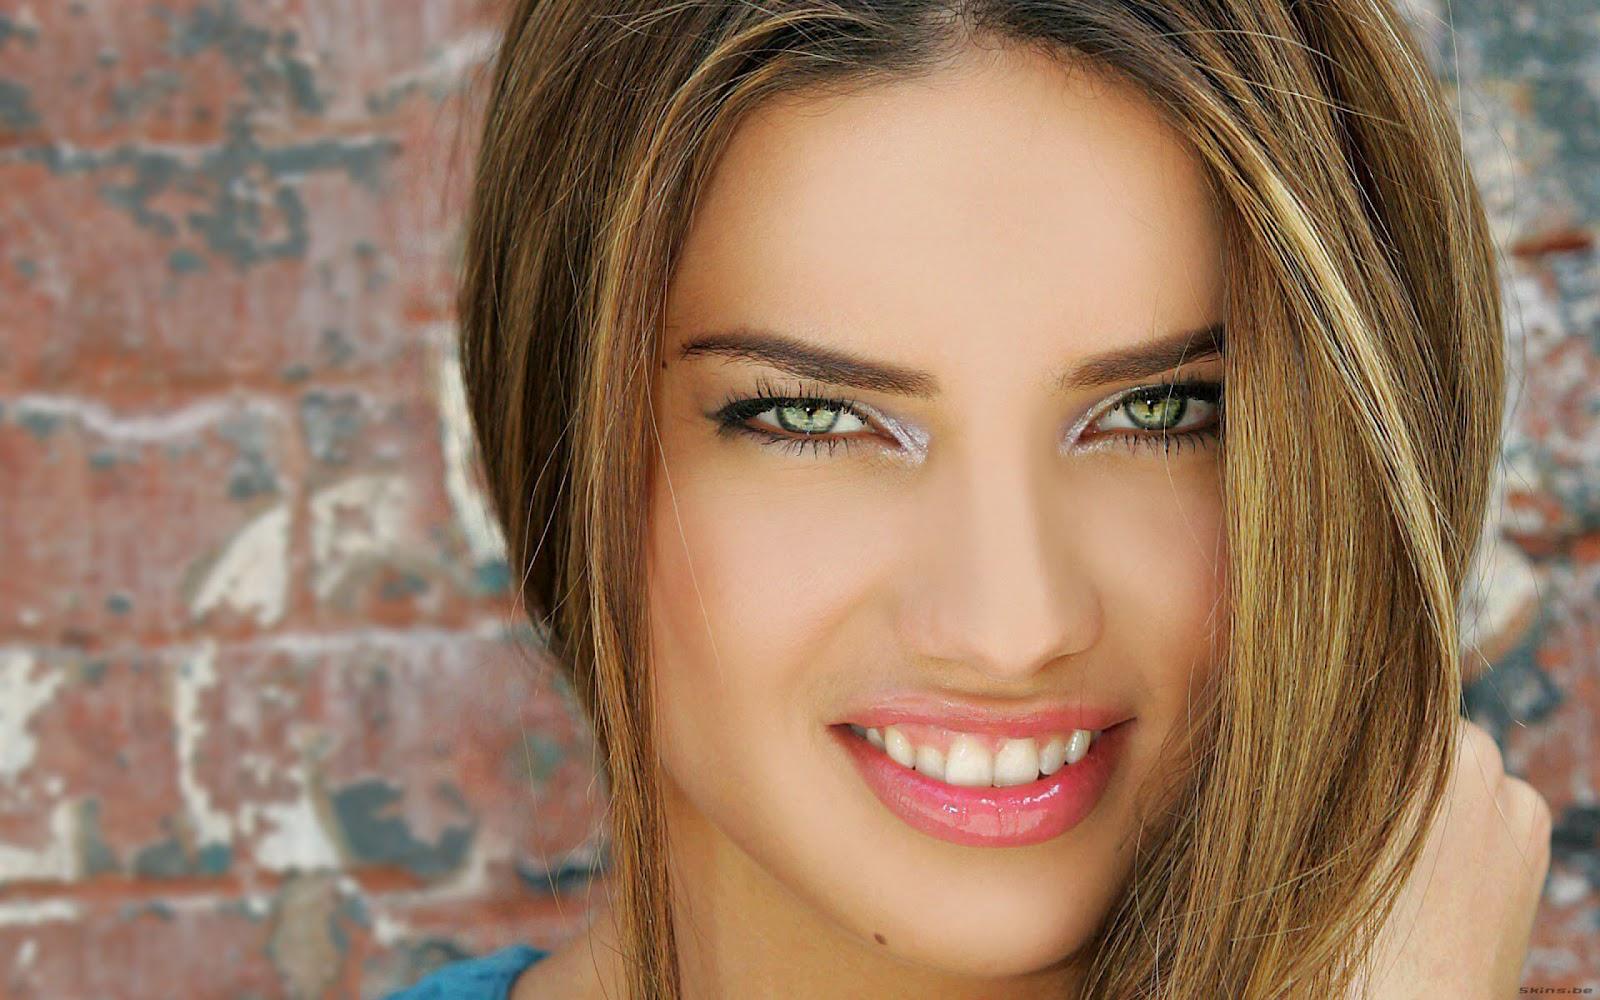 http://1.bp.blogspot.com/-n26Yz2GSnF4/UCymmcdRGGI/AAAAAAAAAIg/KQJ6KVawgpY/s1600/Adriana-Lima-Latest-HD-Wallpapers-Hot-Sexy-Cute-Preety-Hollywood-Actress-Model-Black-Pink-Gray-Red-Dress-Bra-Boobs-Lips+%283%29.jpg